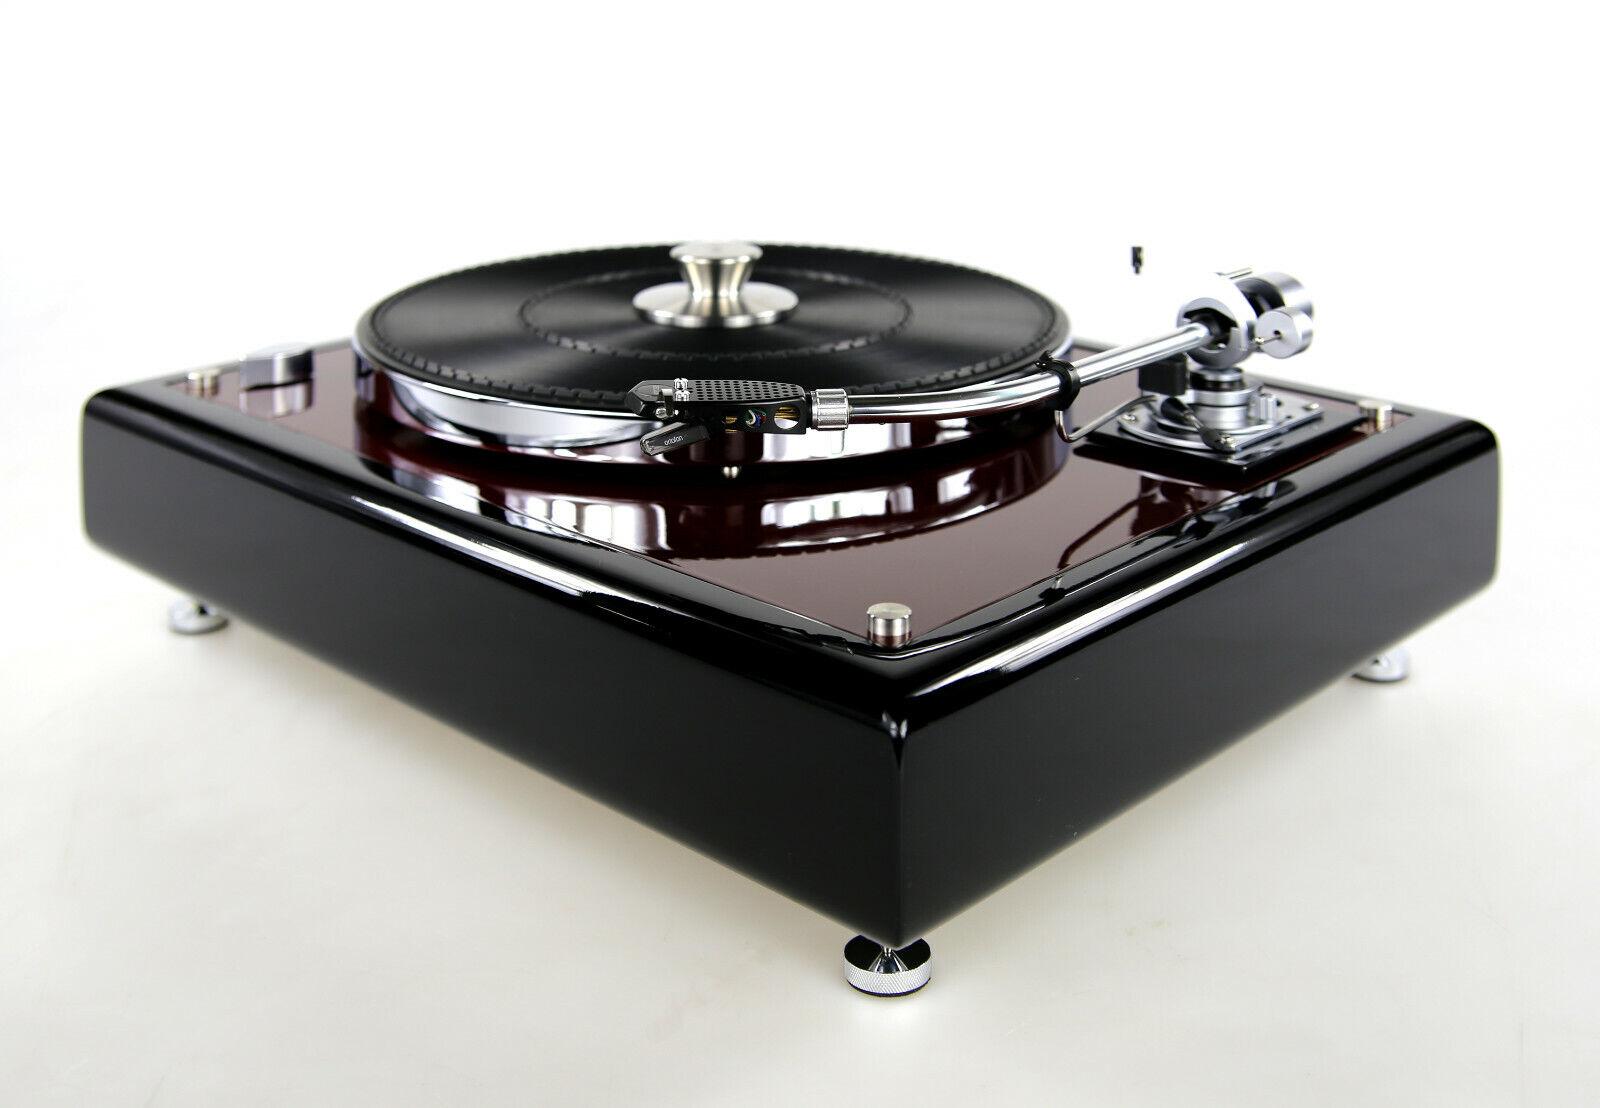 Image 01 - Restored Thorens TD160 Turntable Black Bordeaux Red Met. & SME 3009